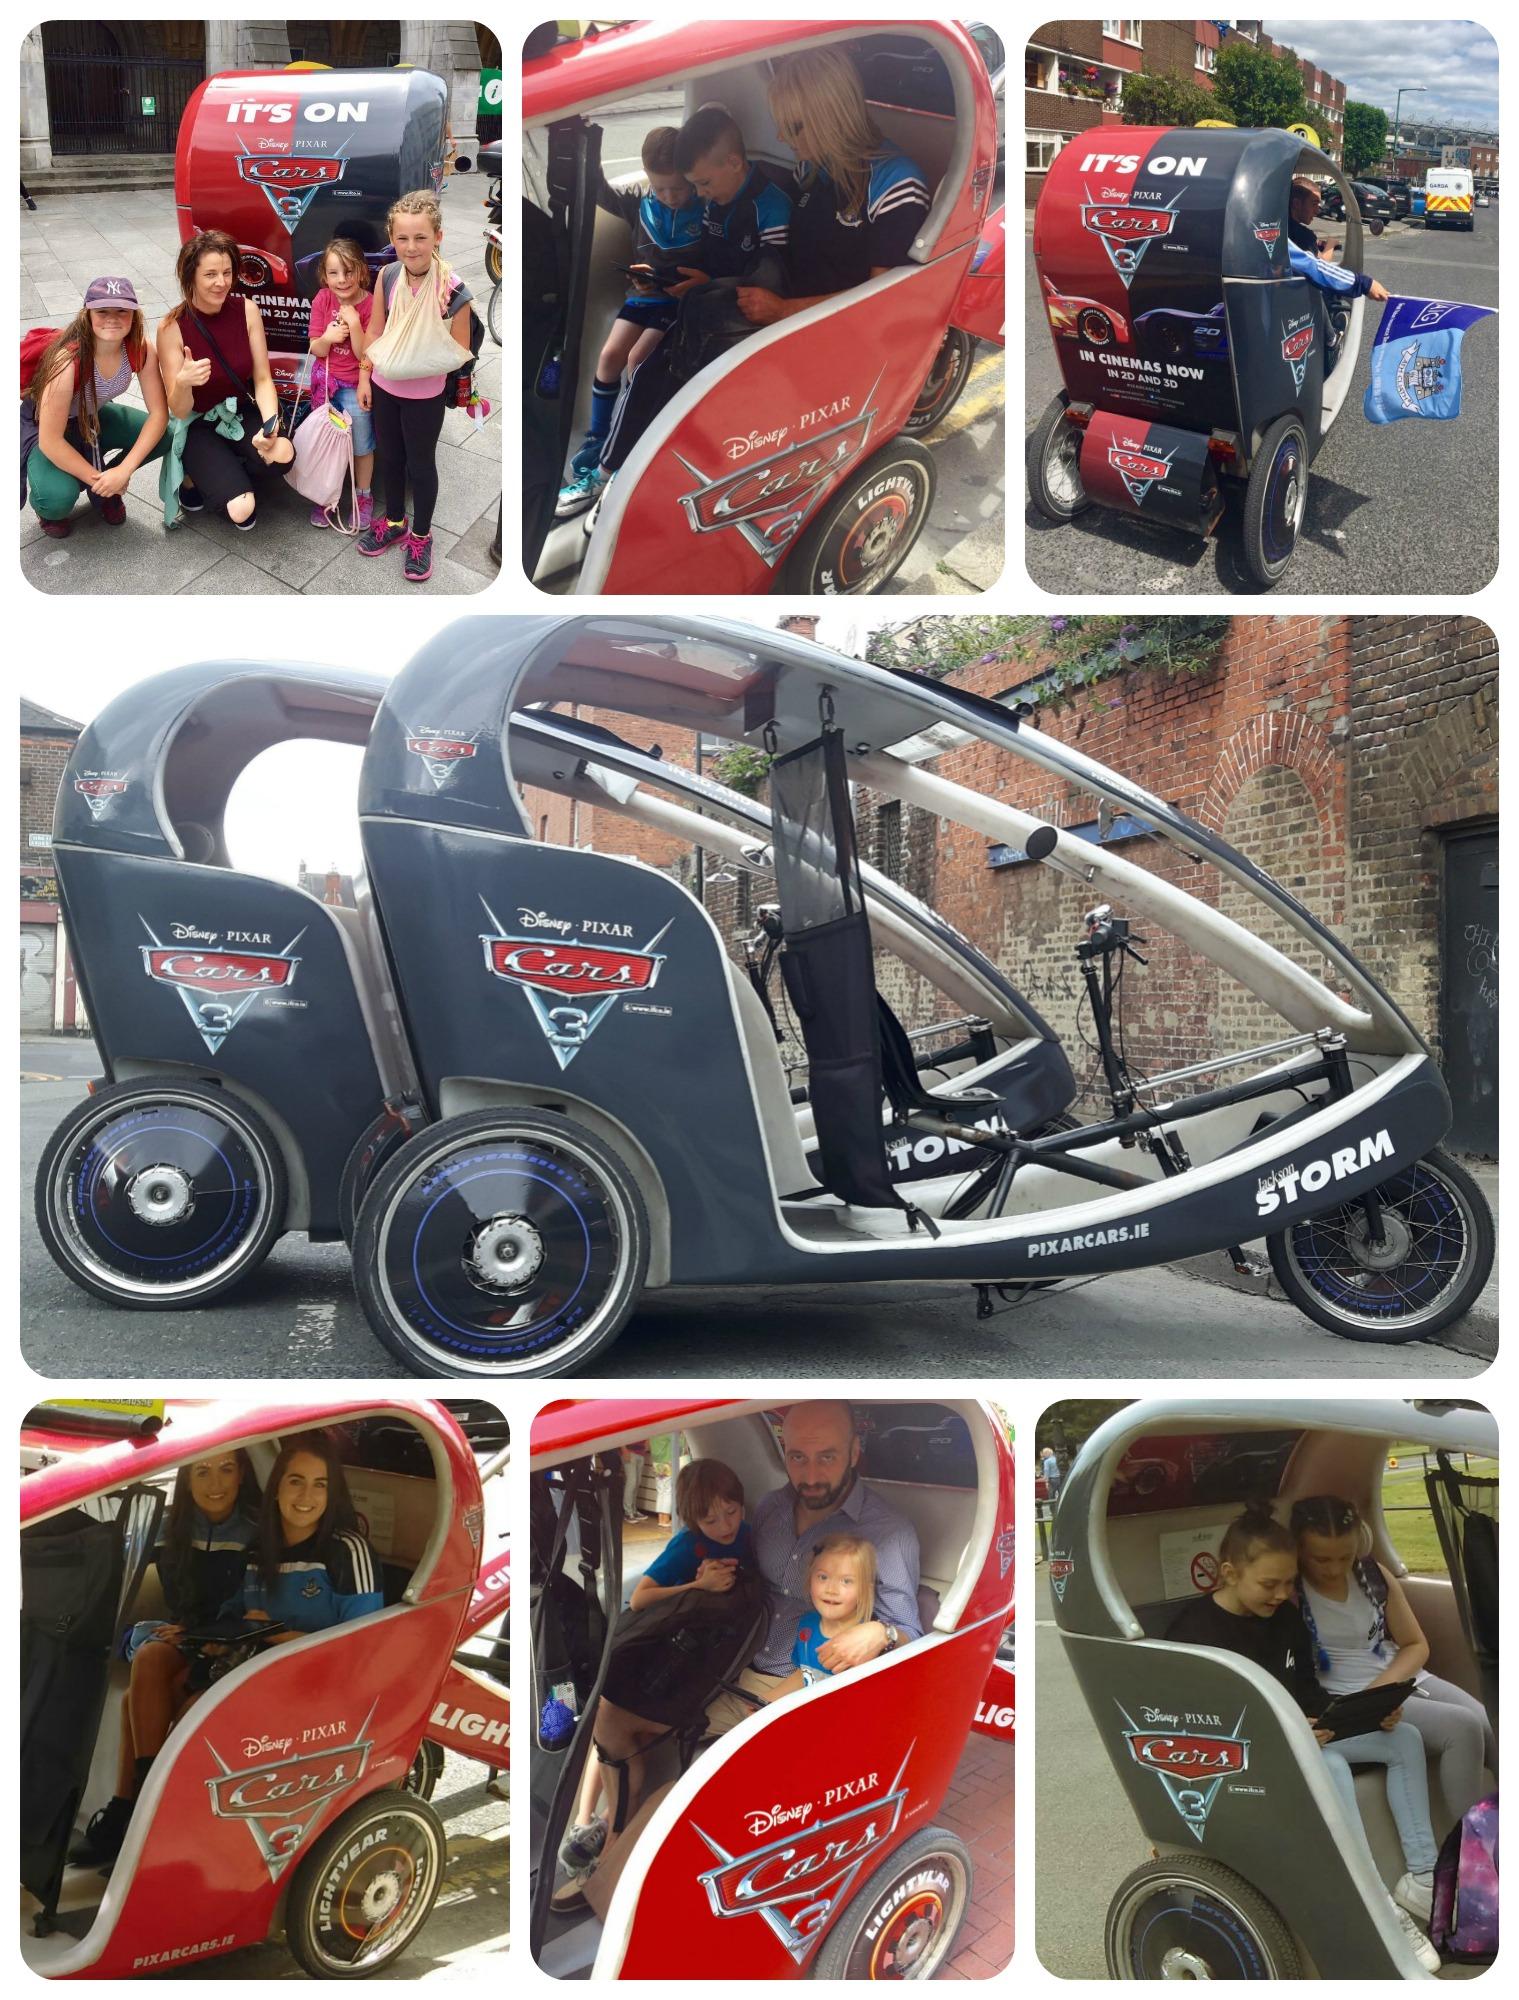 Cars_Ecocab_Collage-2.jpg